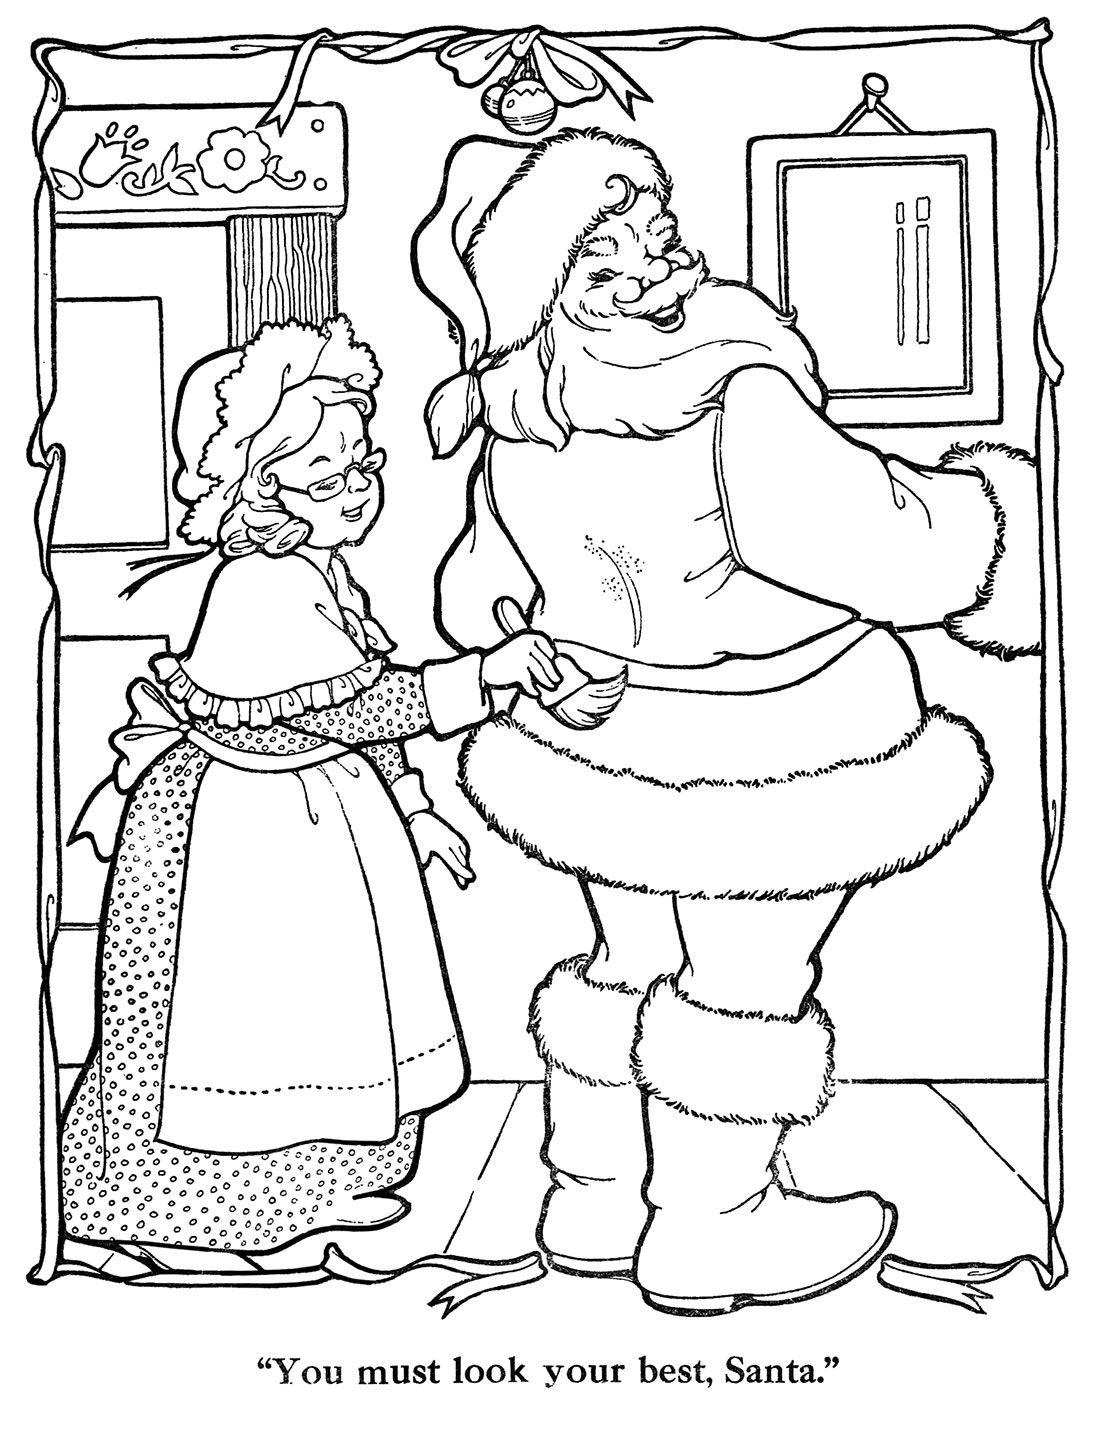 Merry Christmas Paint Book 16 Jpg 1 095 431 Pixels